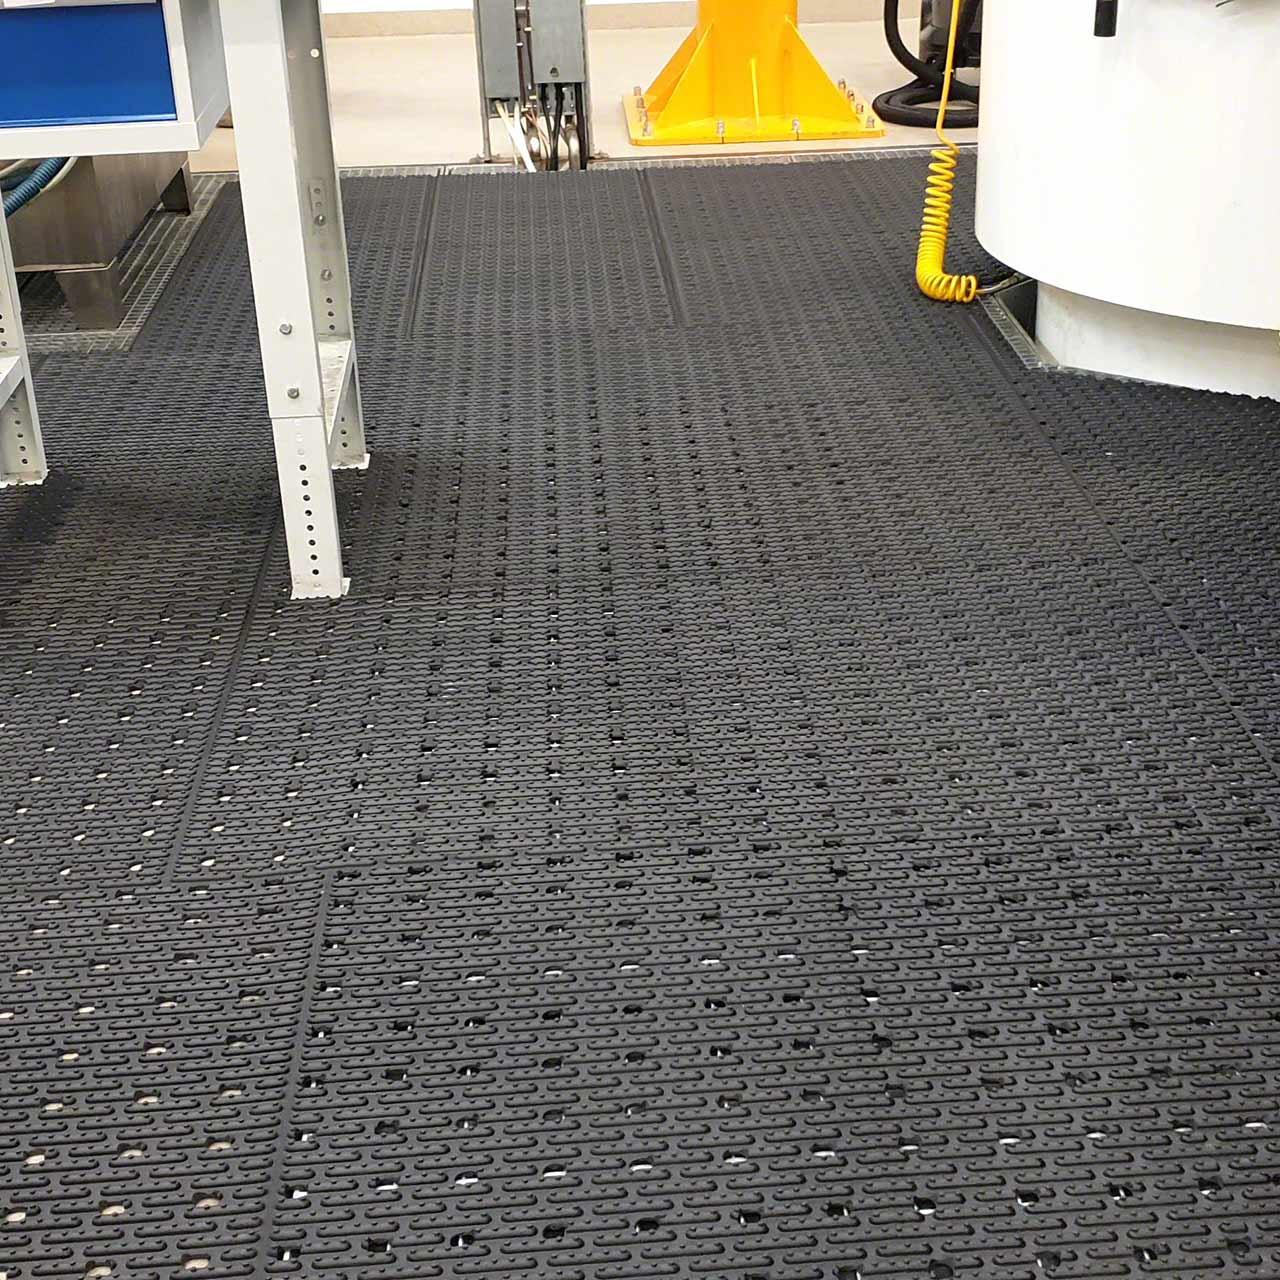 View of installed Ergomat Softline floor matting